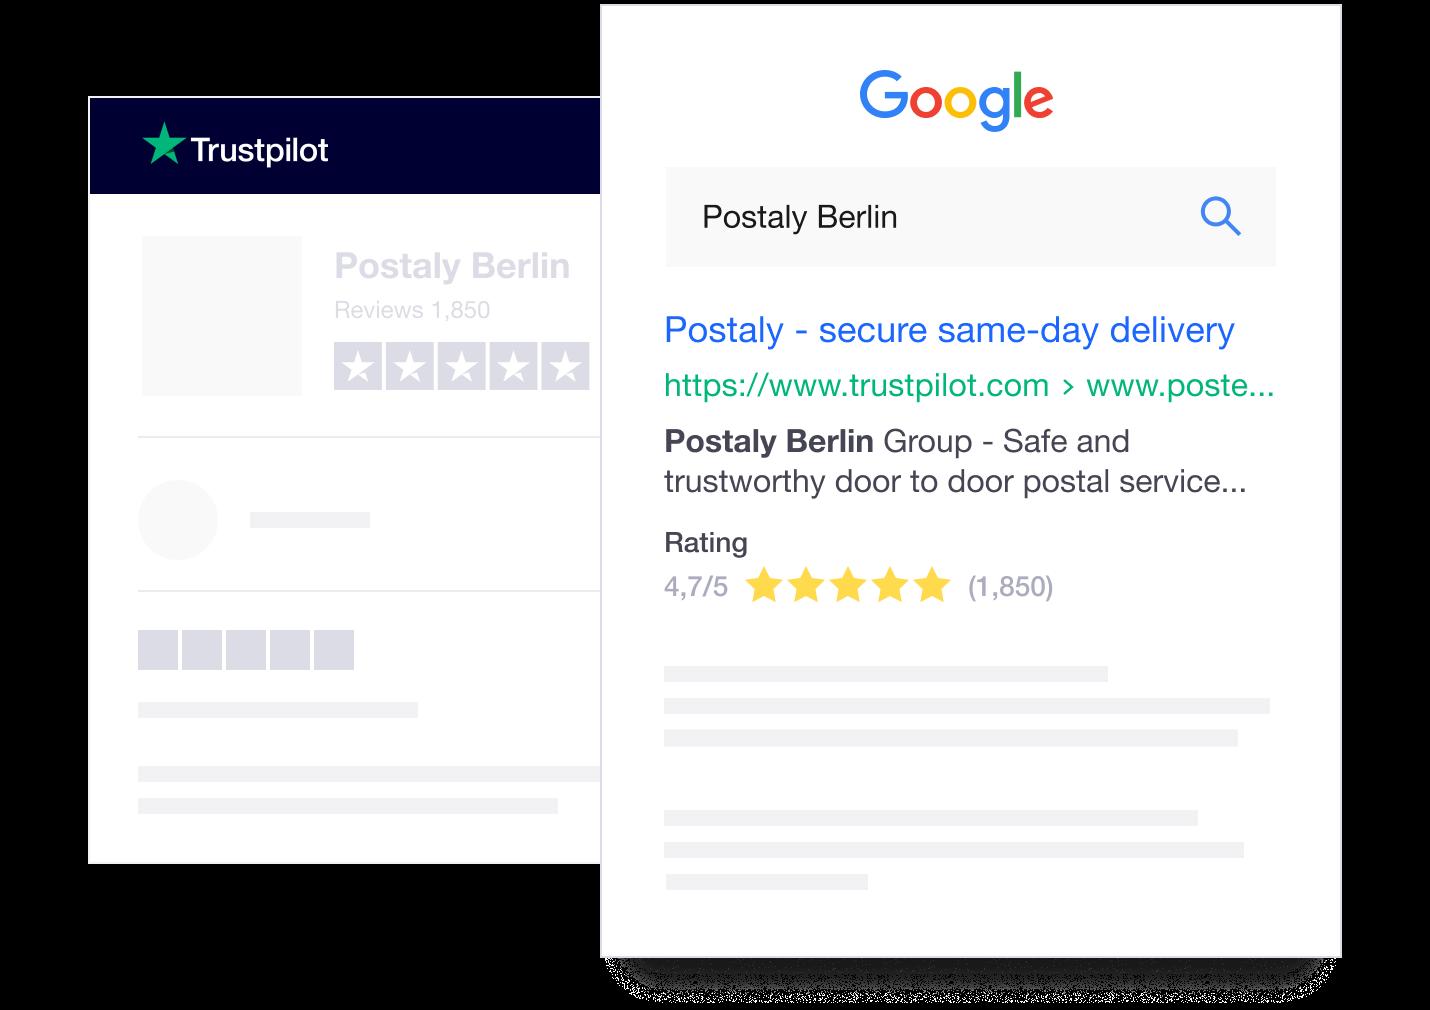 Trustpilot Location Reviews on Google Search (Local SEO)